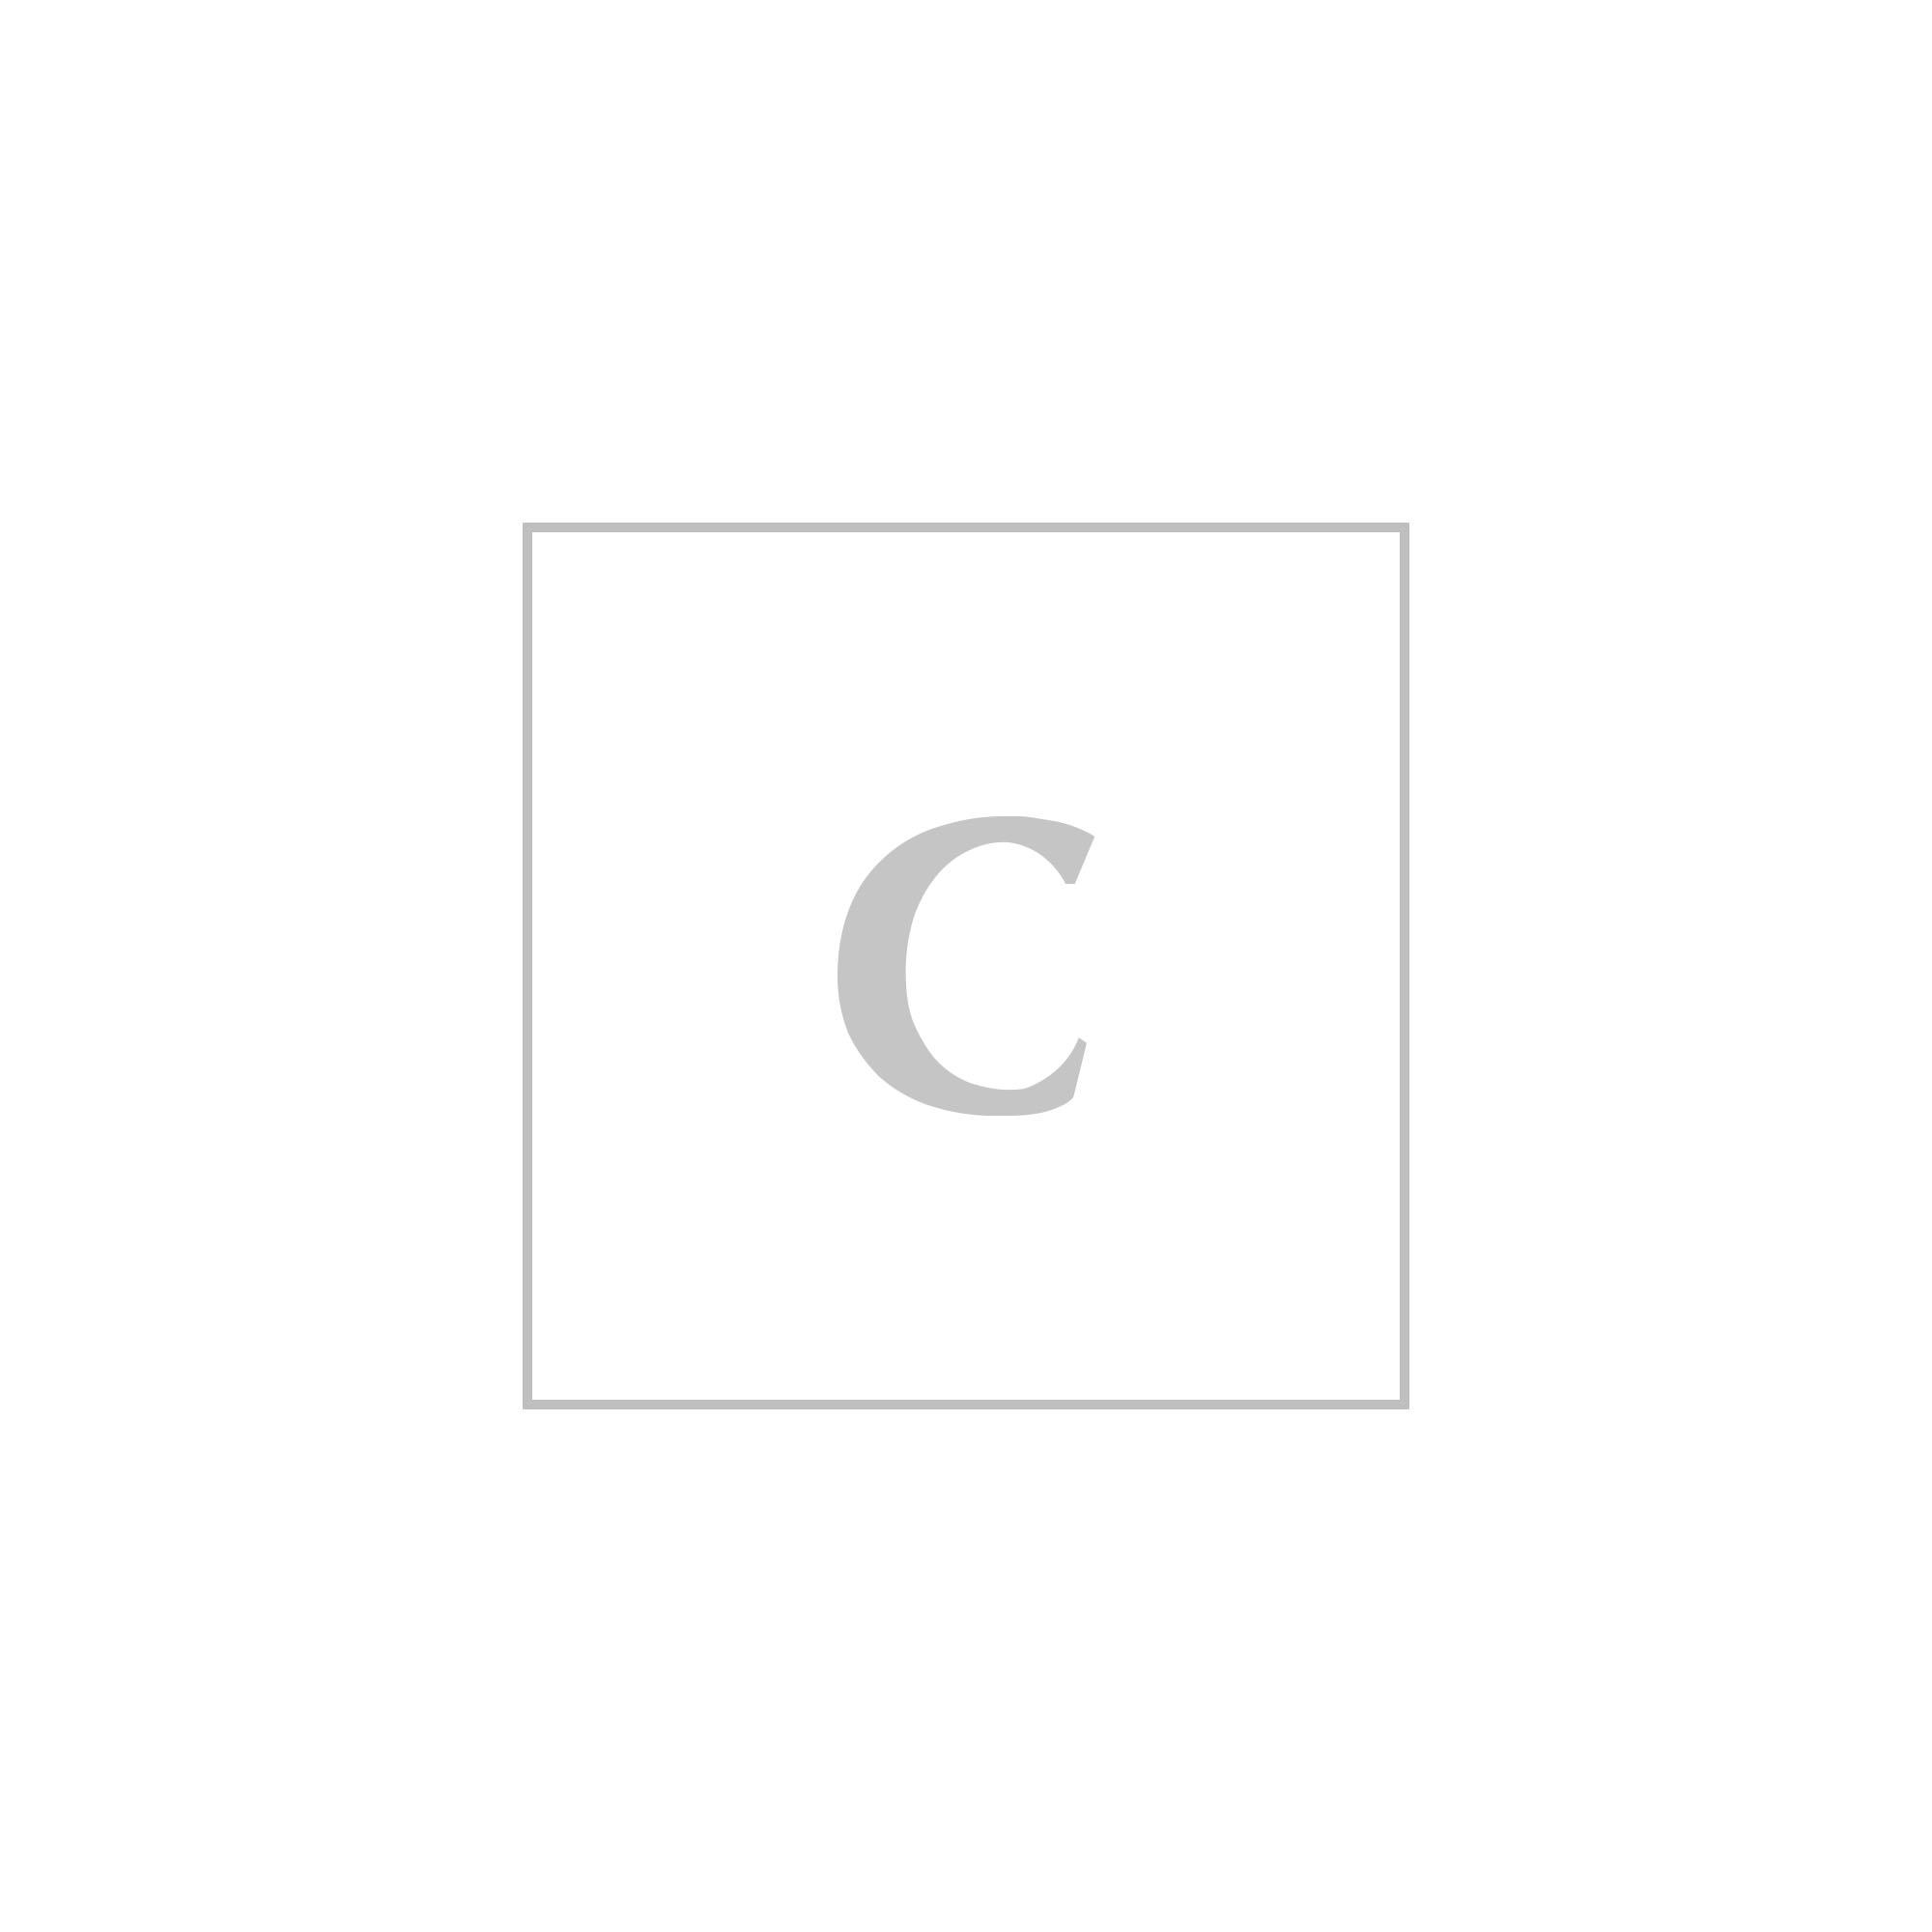 Saint laurent ysl short handle monogram bag